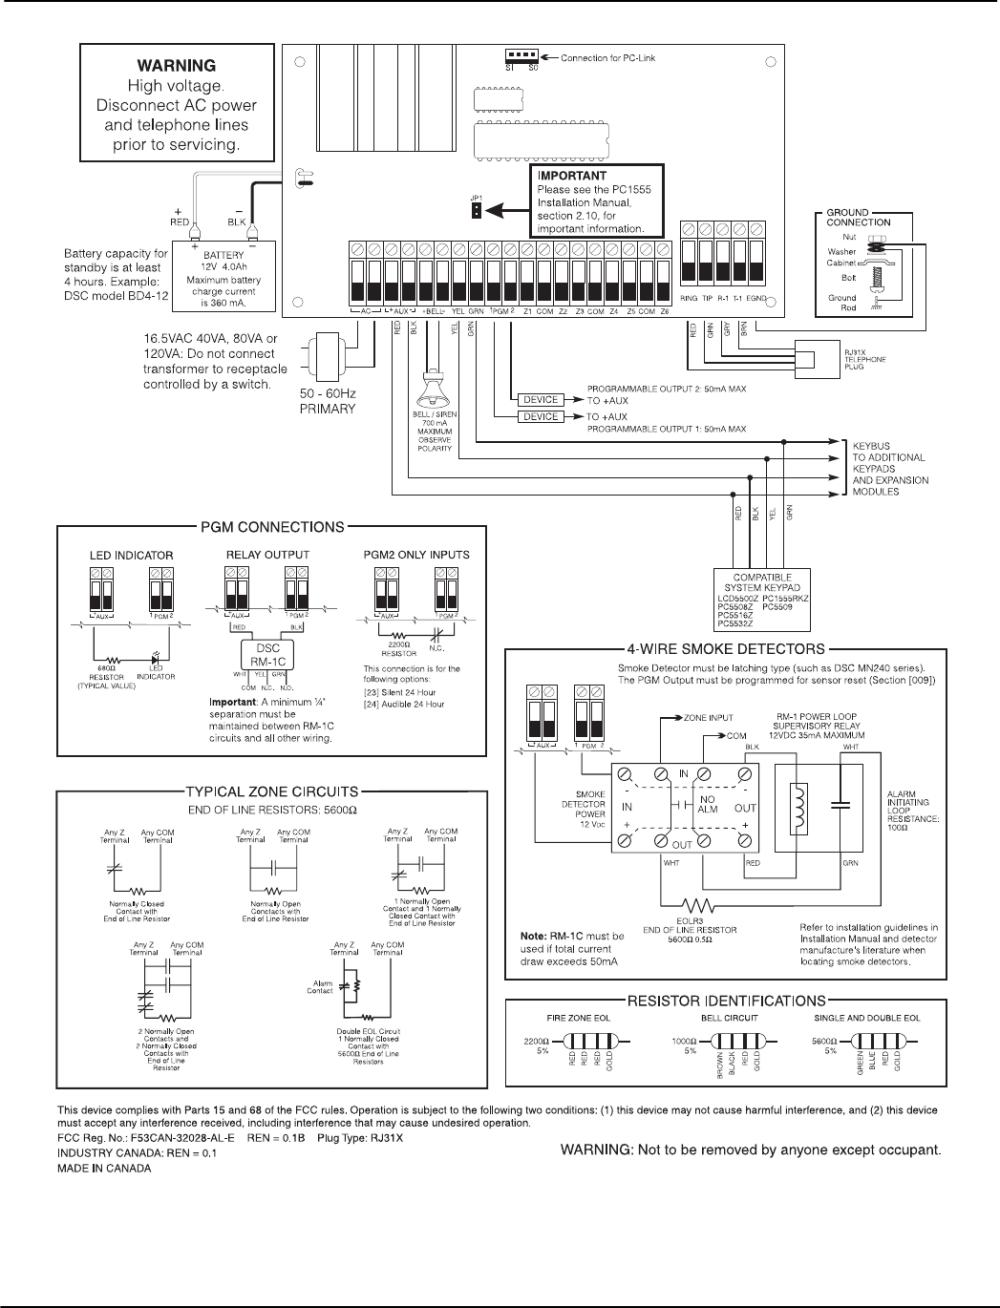 medium resolution of dsc gs boost wiring diagram simple wiring schema  pelco wiring diagram dsc gs